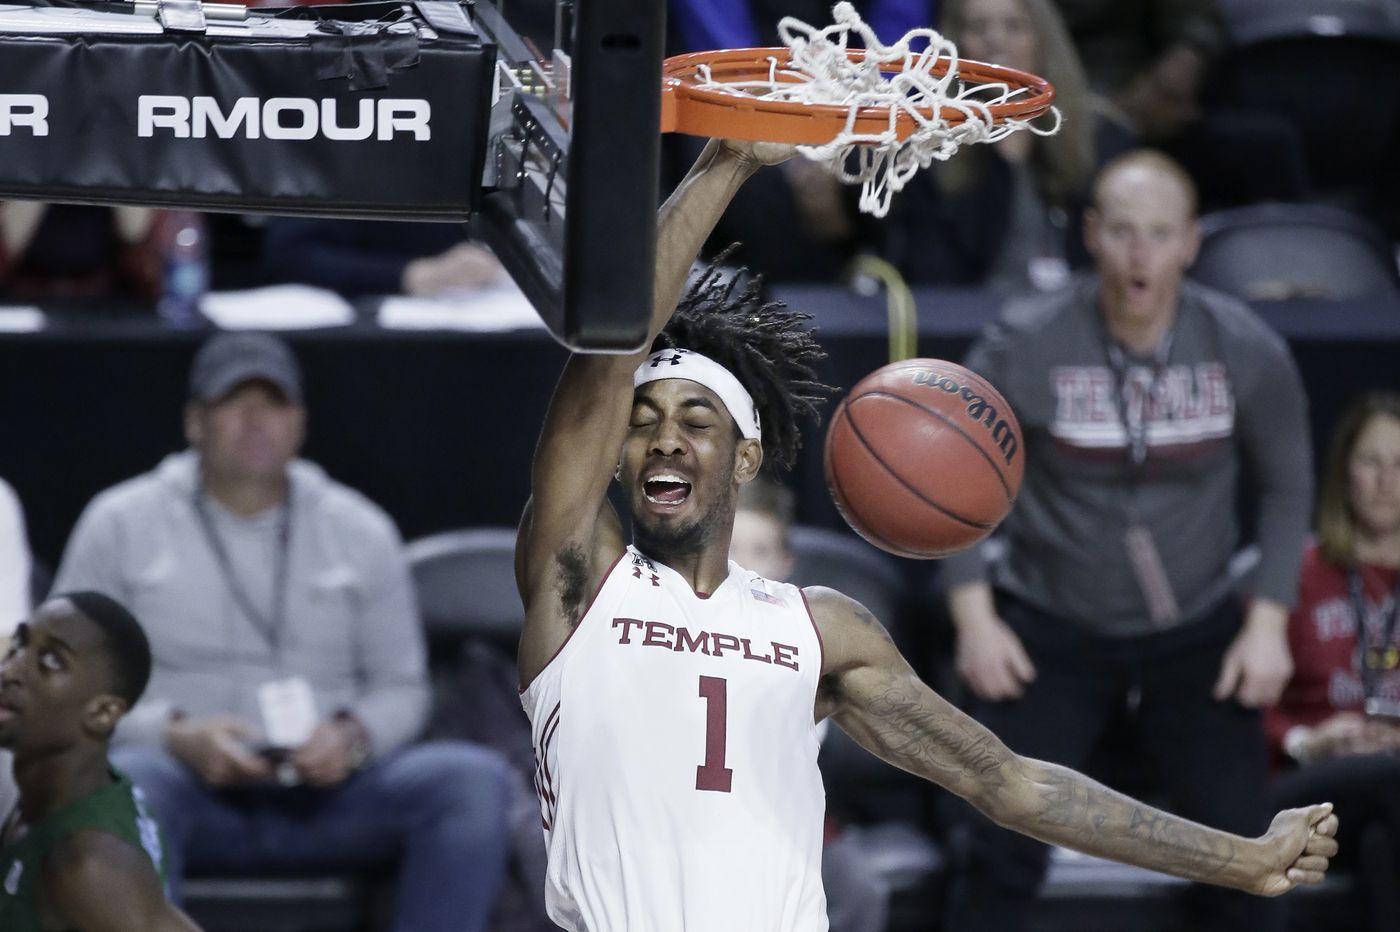 Temple's regular-season finale vs. Central Florida has AAC and NCAA ramifications